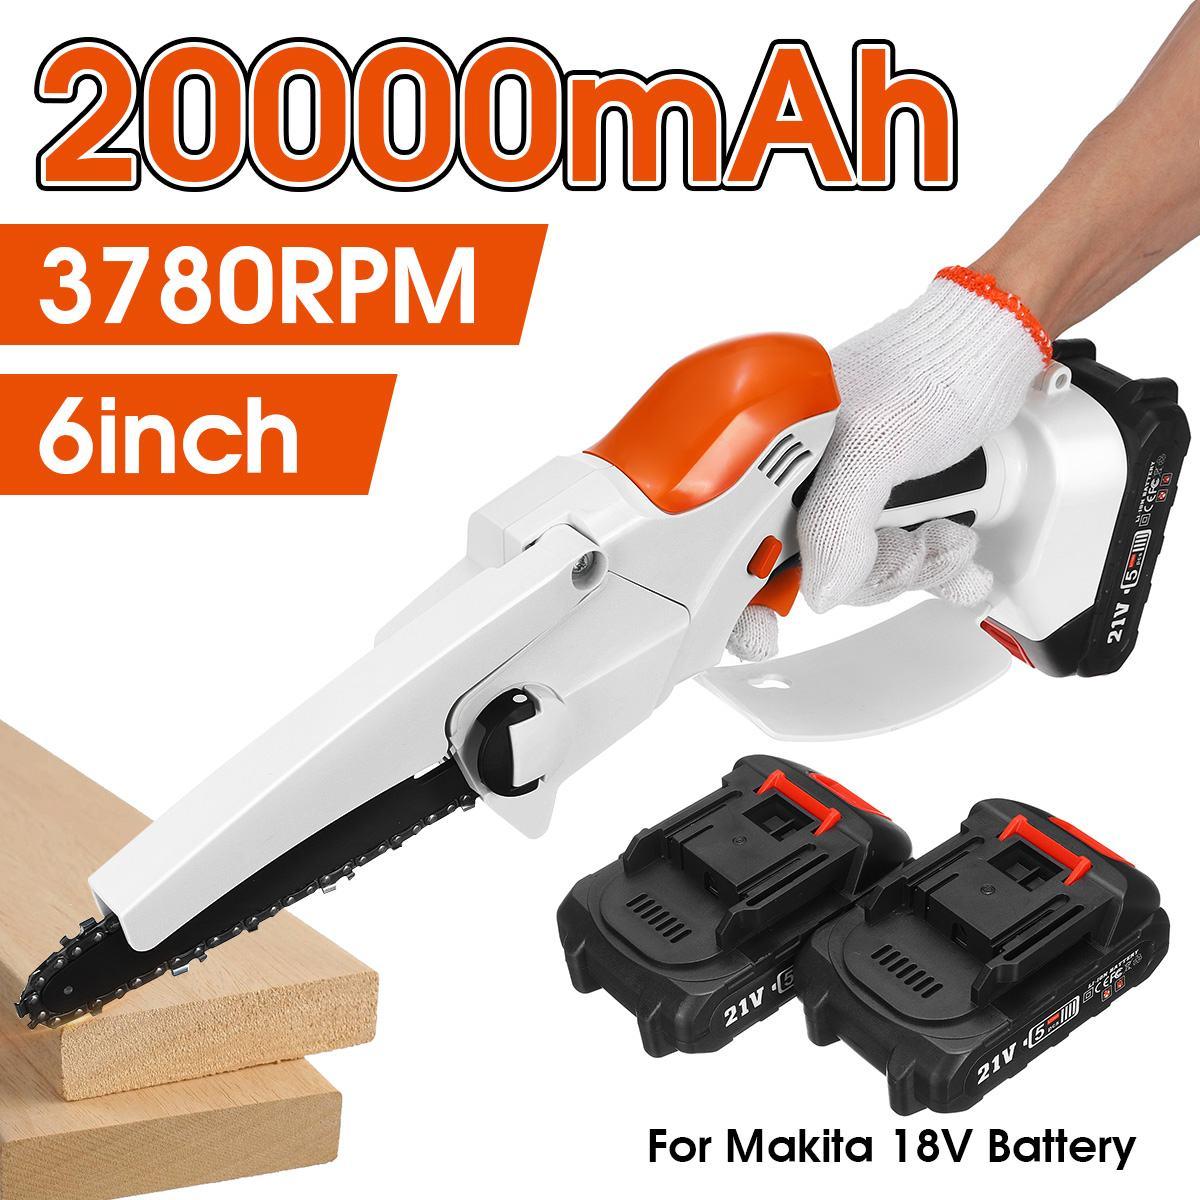 20000mAh 21 فولت 6 بوصة منشار كهربائي صغير قابلة للشحن بالمنشار 2 بطاريات تشذيب حديقة أداة السلطة لبطارية ماكيتا 18 فولت